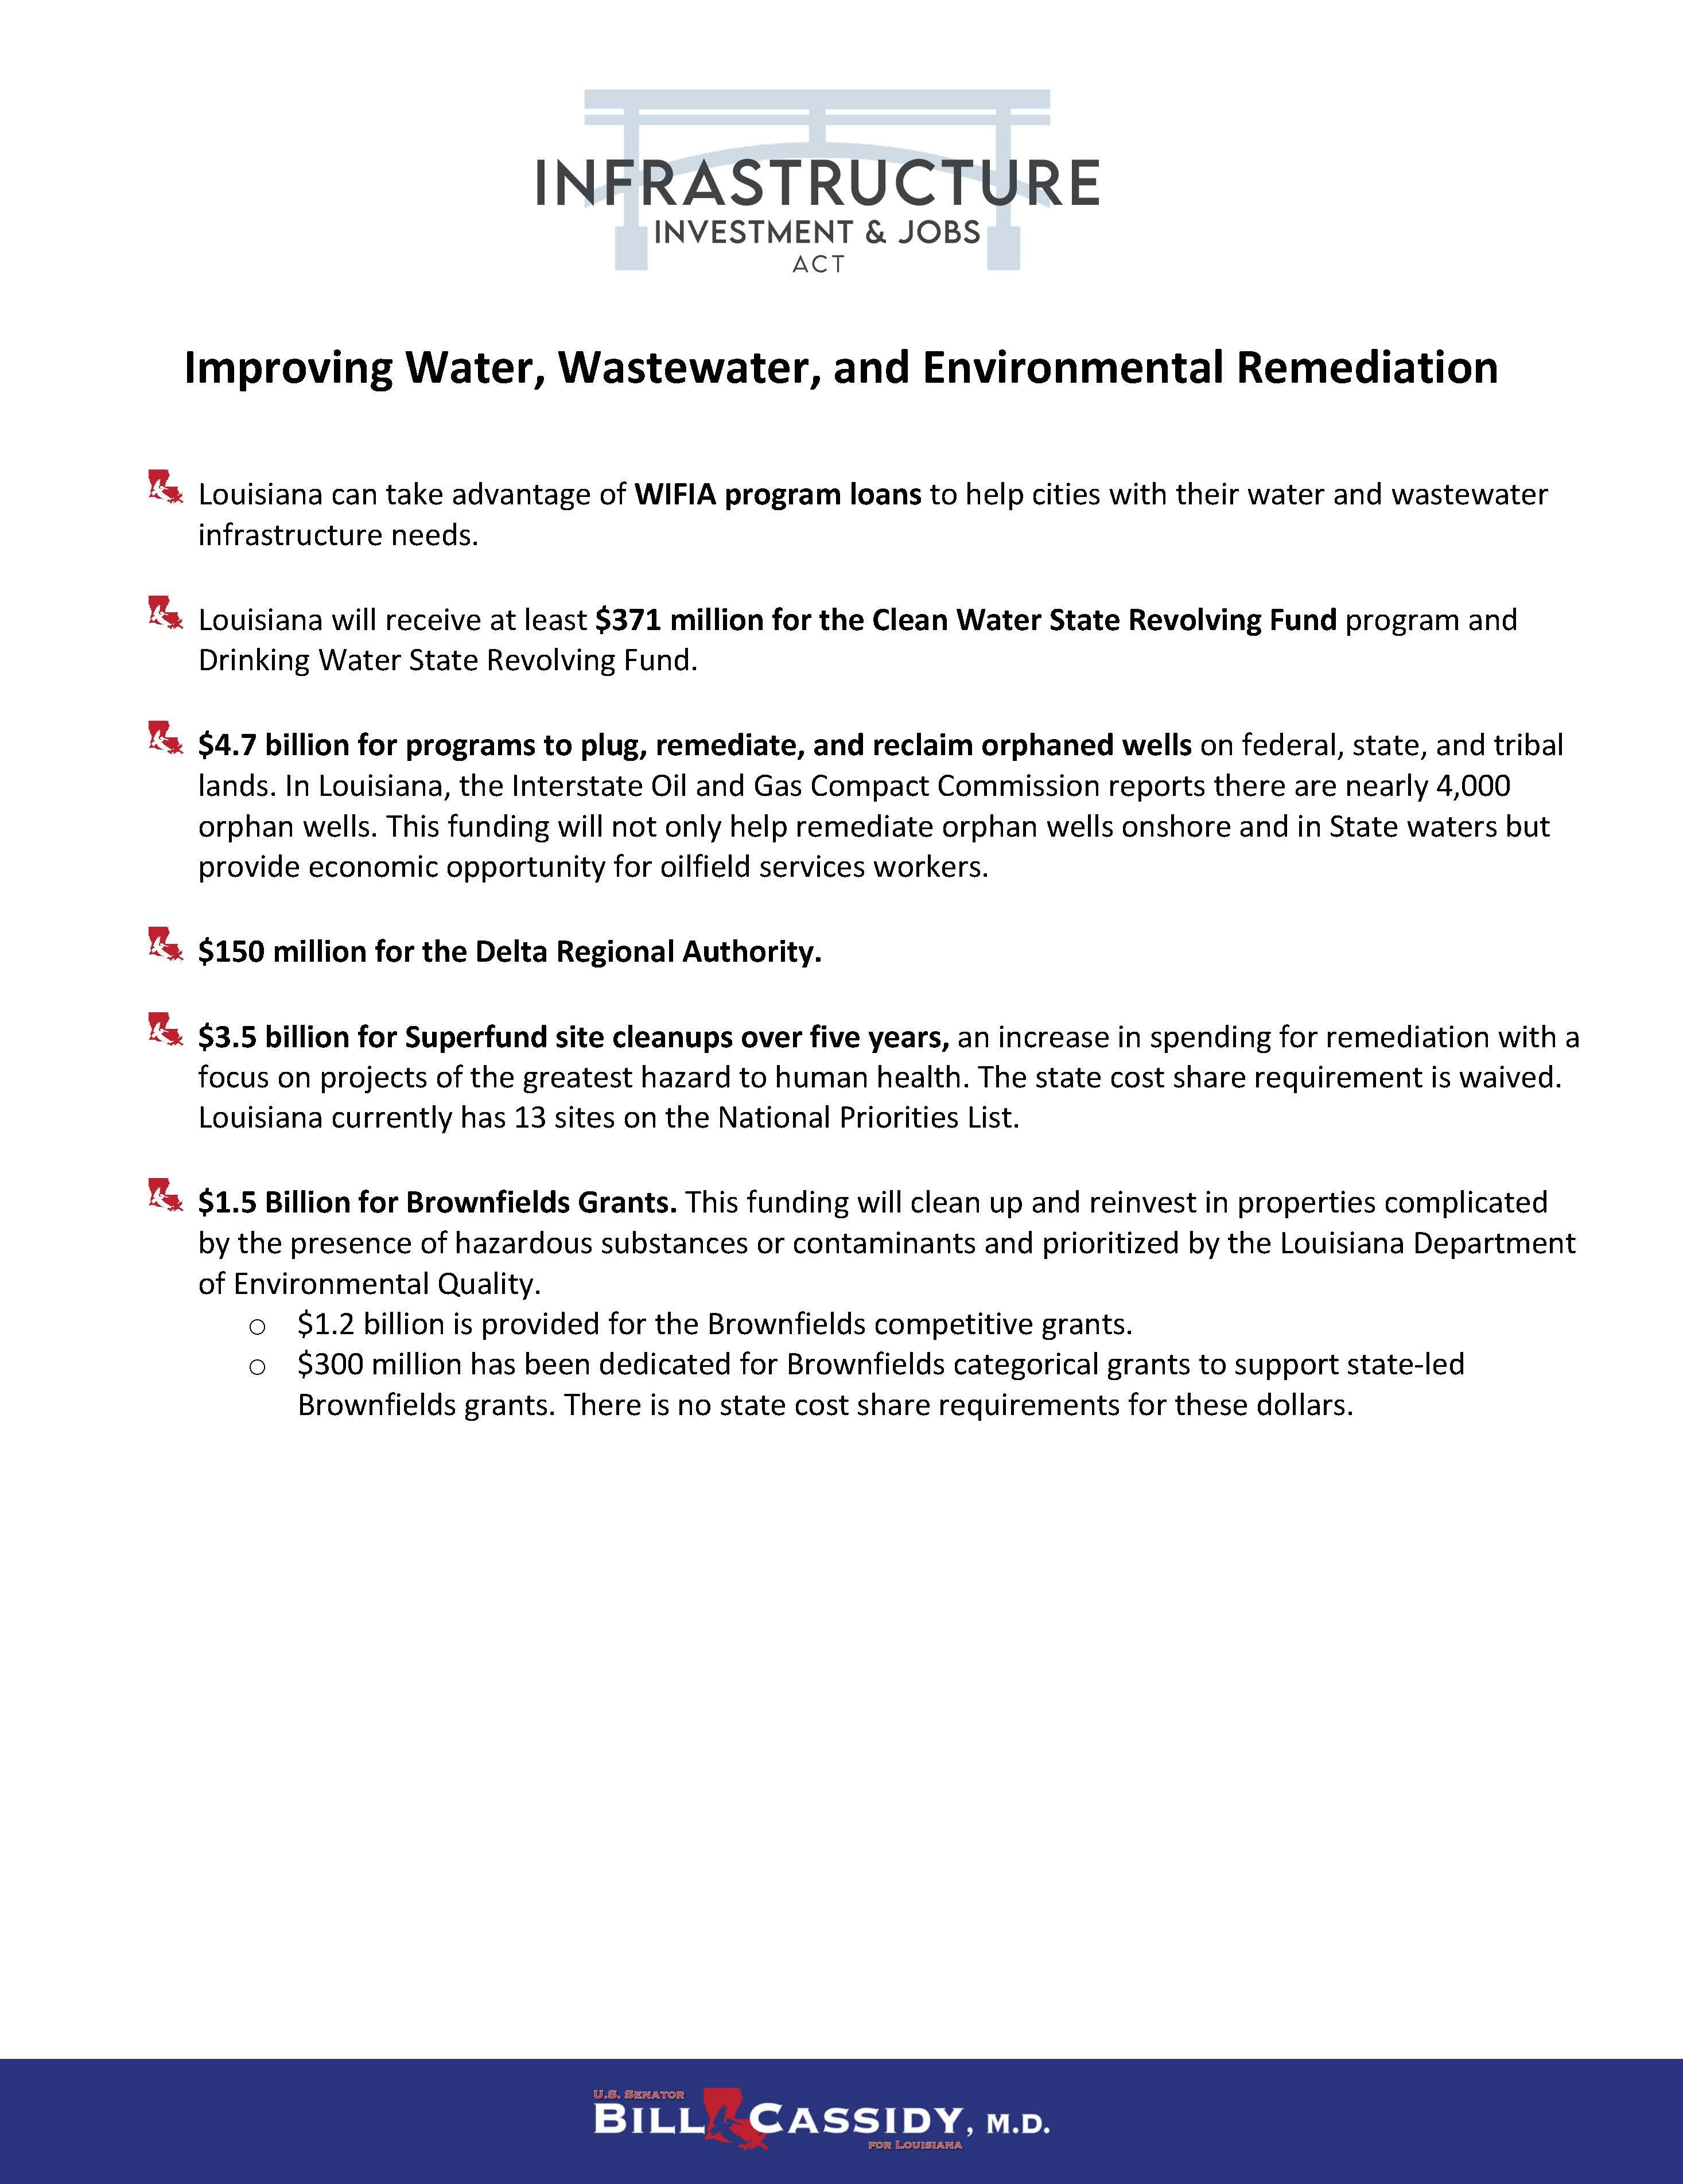 IIJA Water, Wastewater, and Environmental Remediation